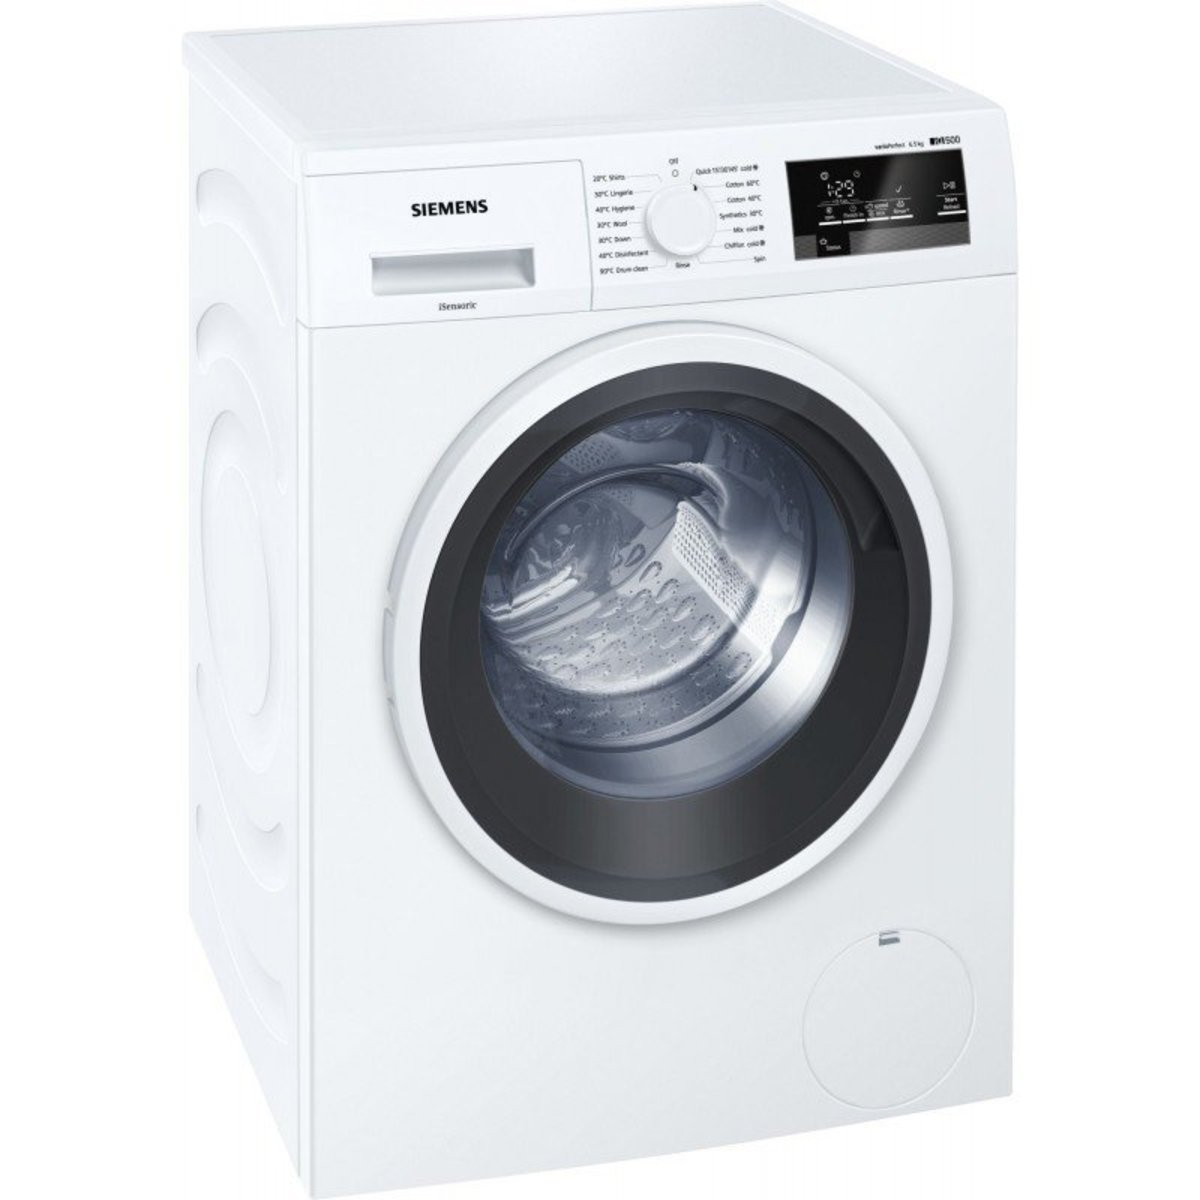 iQ500 Frontloading slim washer 6.5KG WS12K440HK